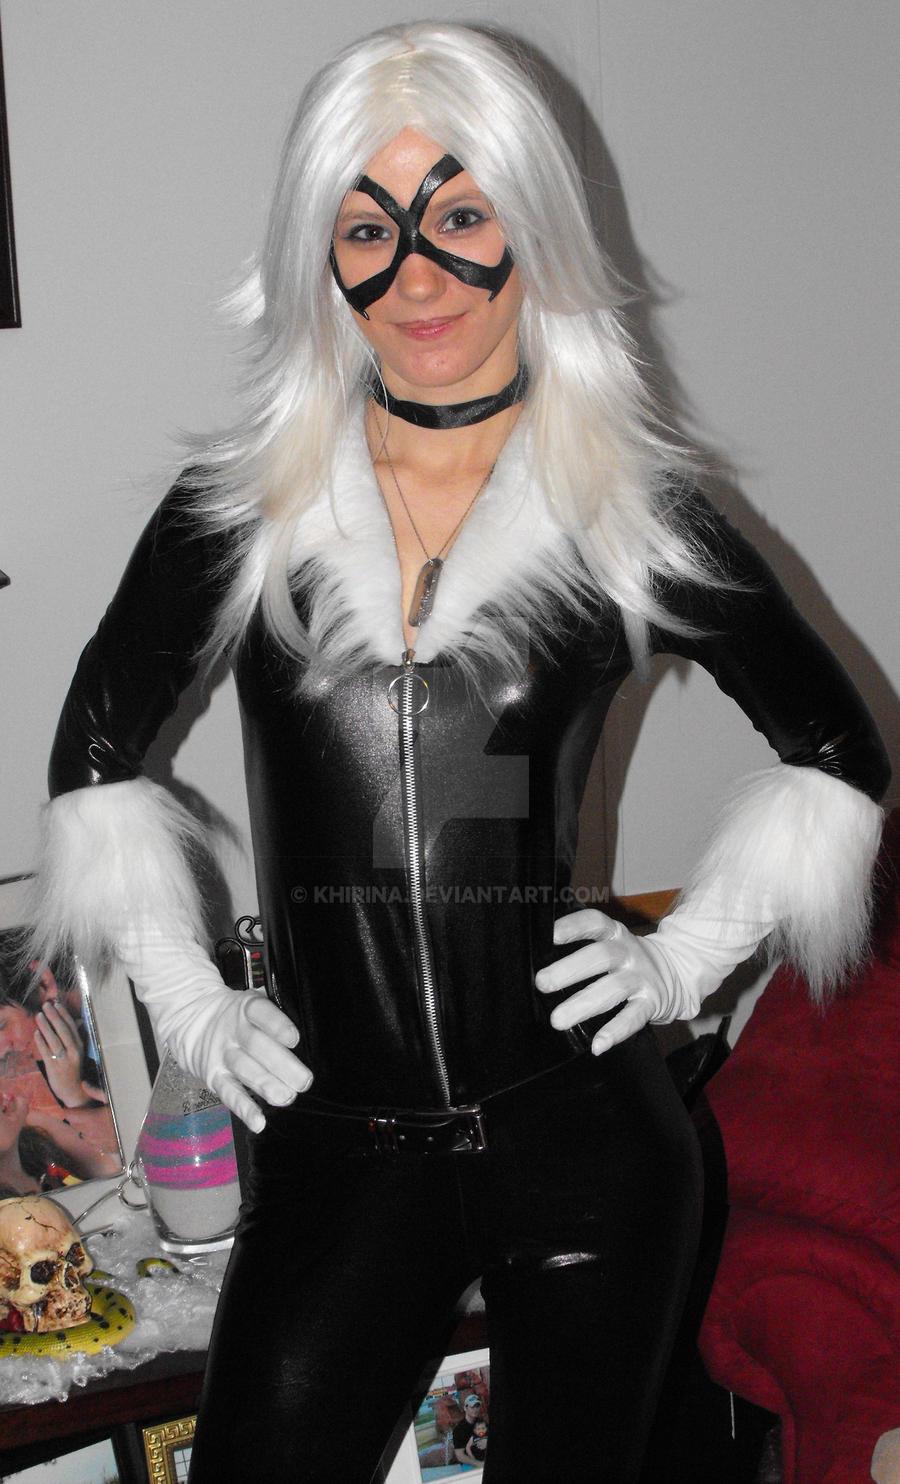 Black Cat Costume by Khirina Black Cat Costume by Khirina & Black Cat Costume by Khirina on DeviantArt